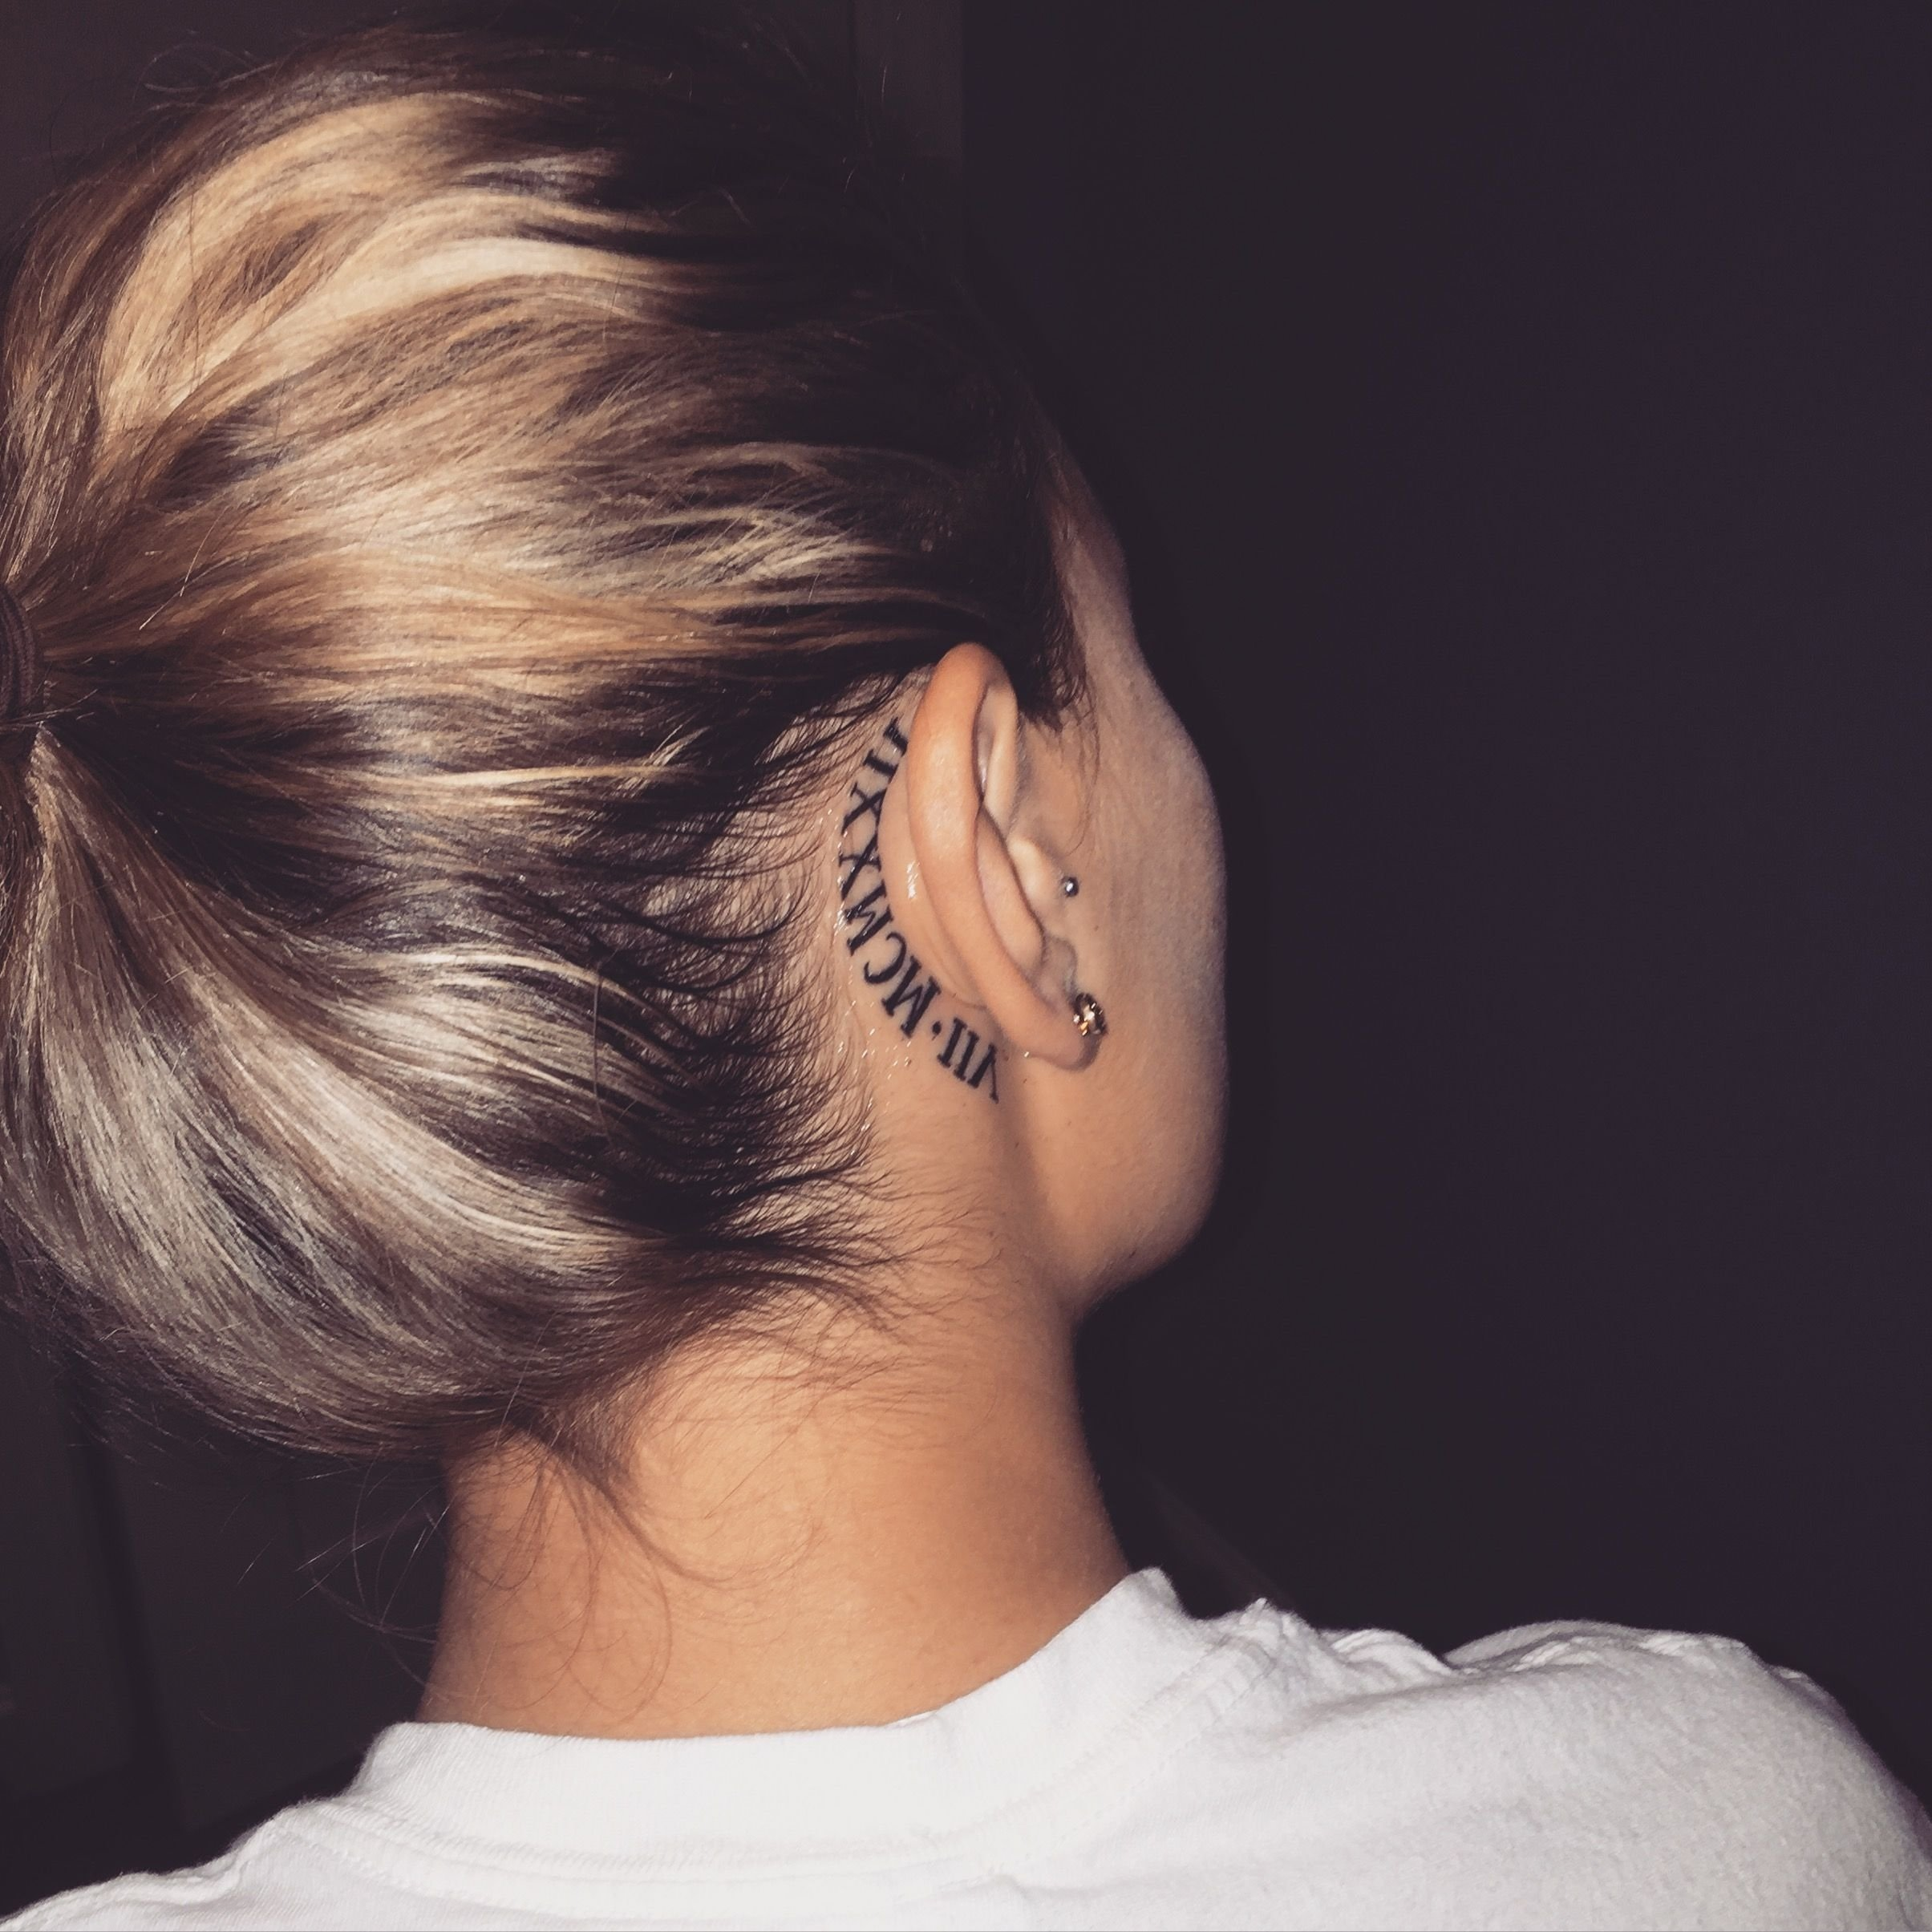 10 Perfect Behind The Ear Tattoo Ideas behind ear tattoos purple hearts pinterest tattoo tatting and 1 2020